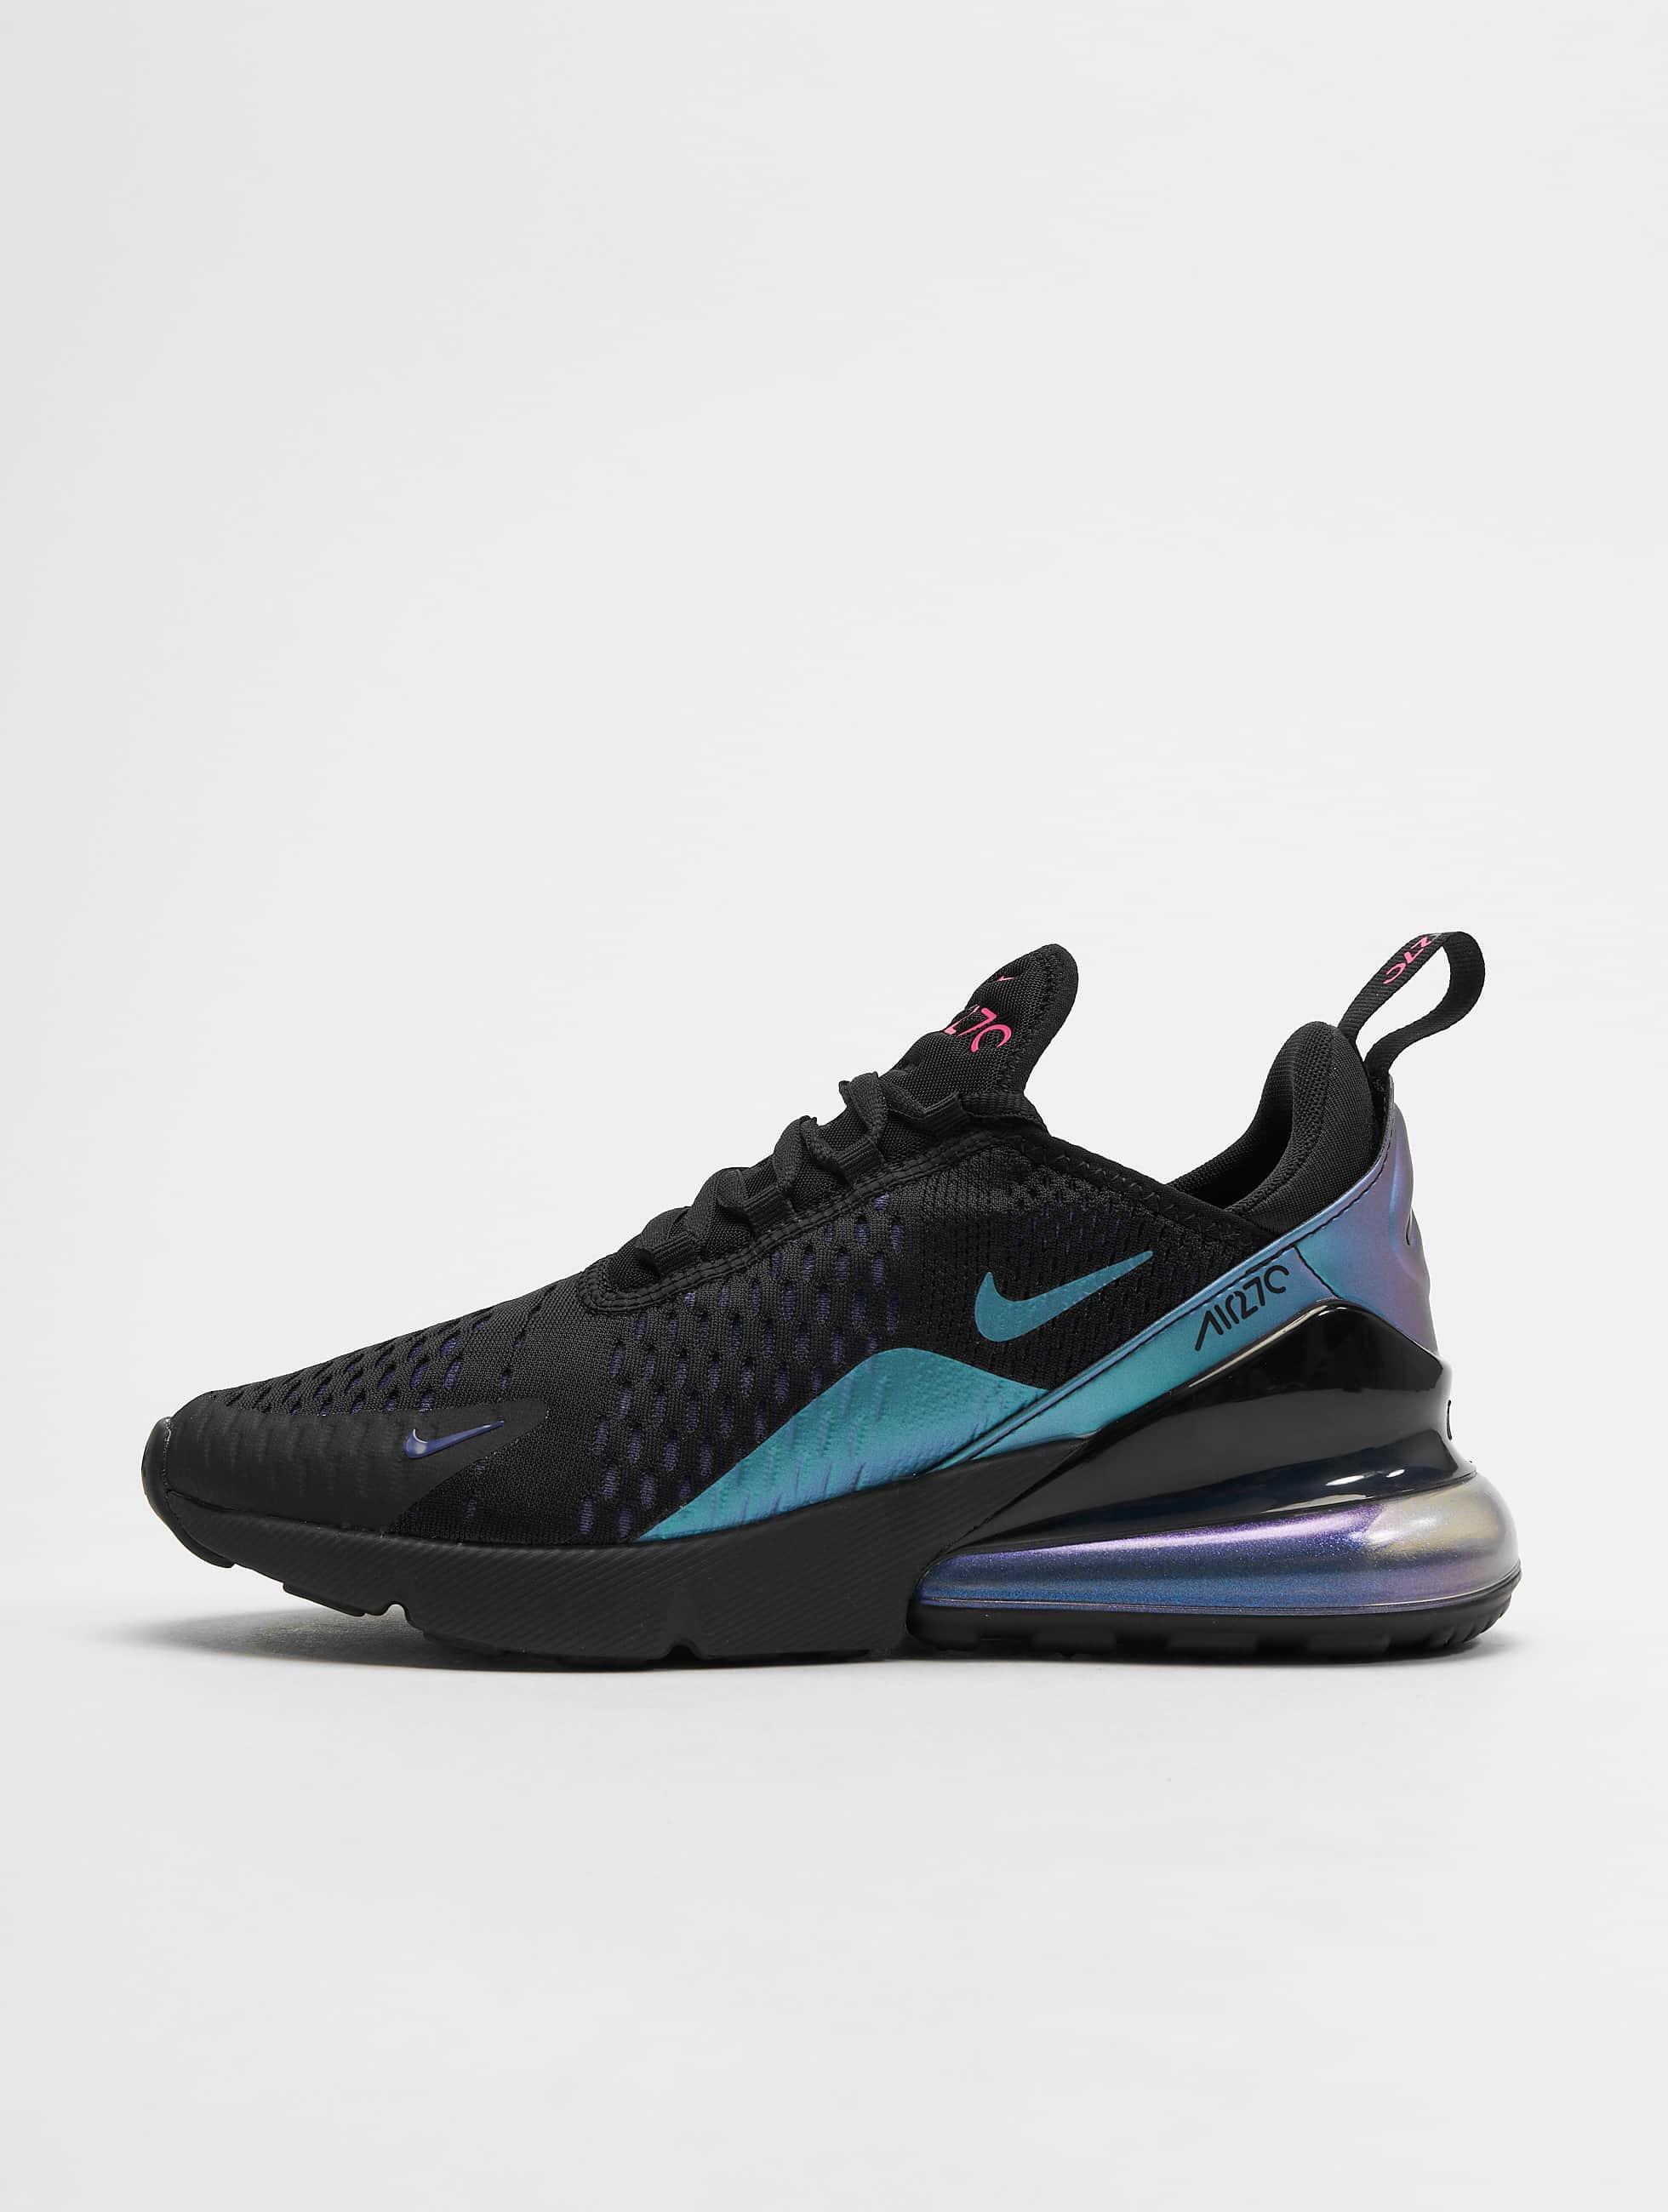 30af9a39a11 Nike schoen / sneaker Air Max 270 in zwart 581790